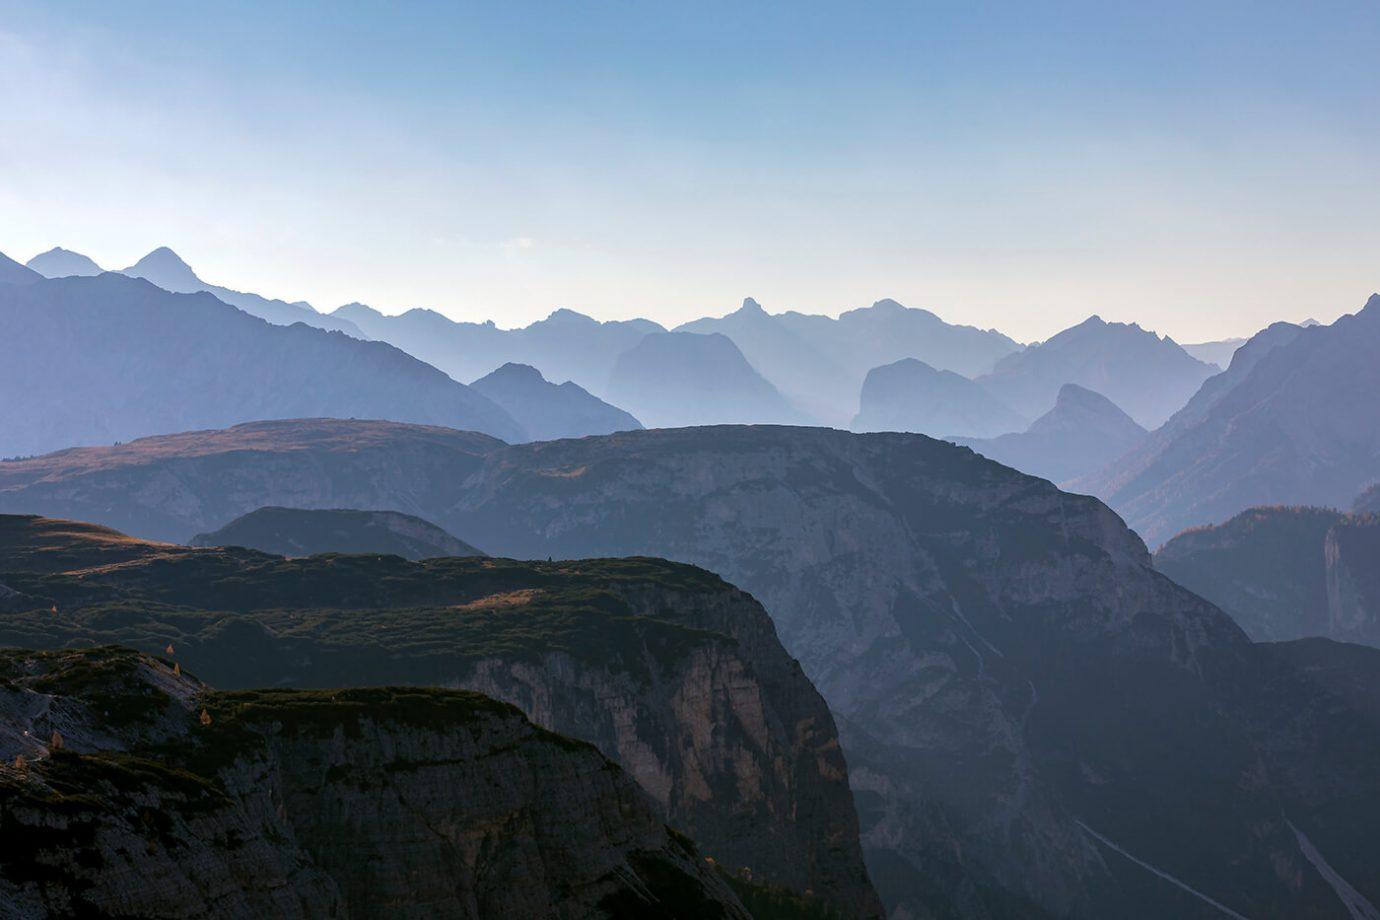 Layers, Tre Cime di Lavaredo, Dolomites, Italy, Italy, Melvin Nicholson Photography